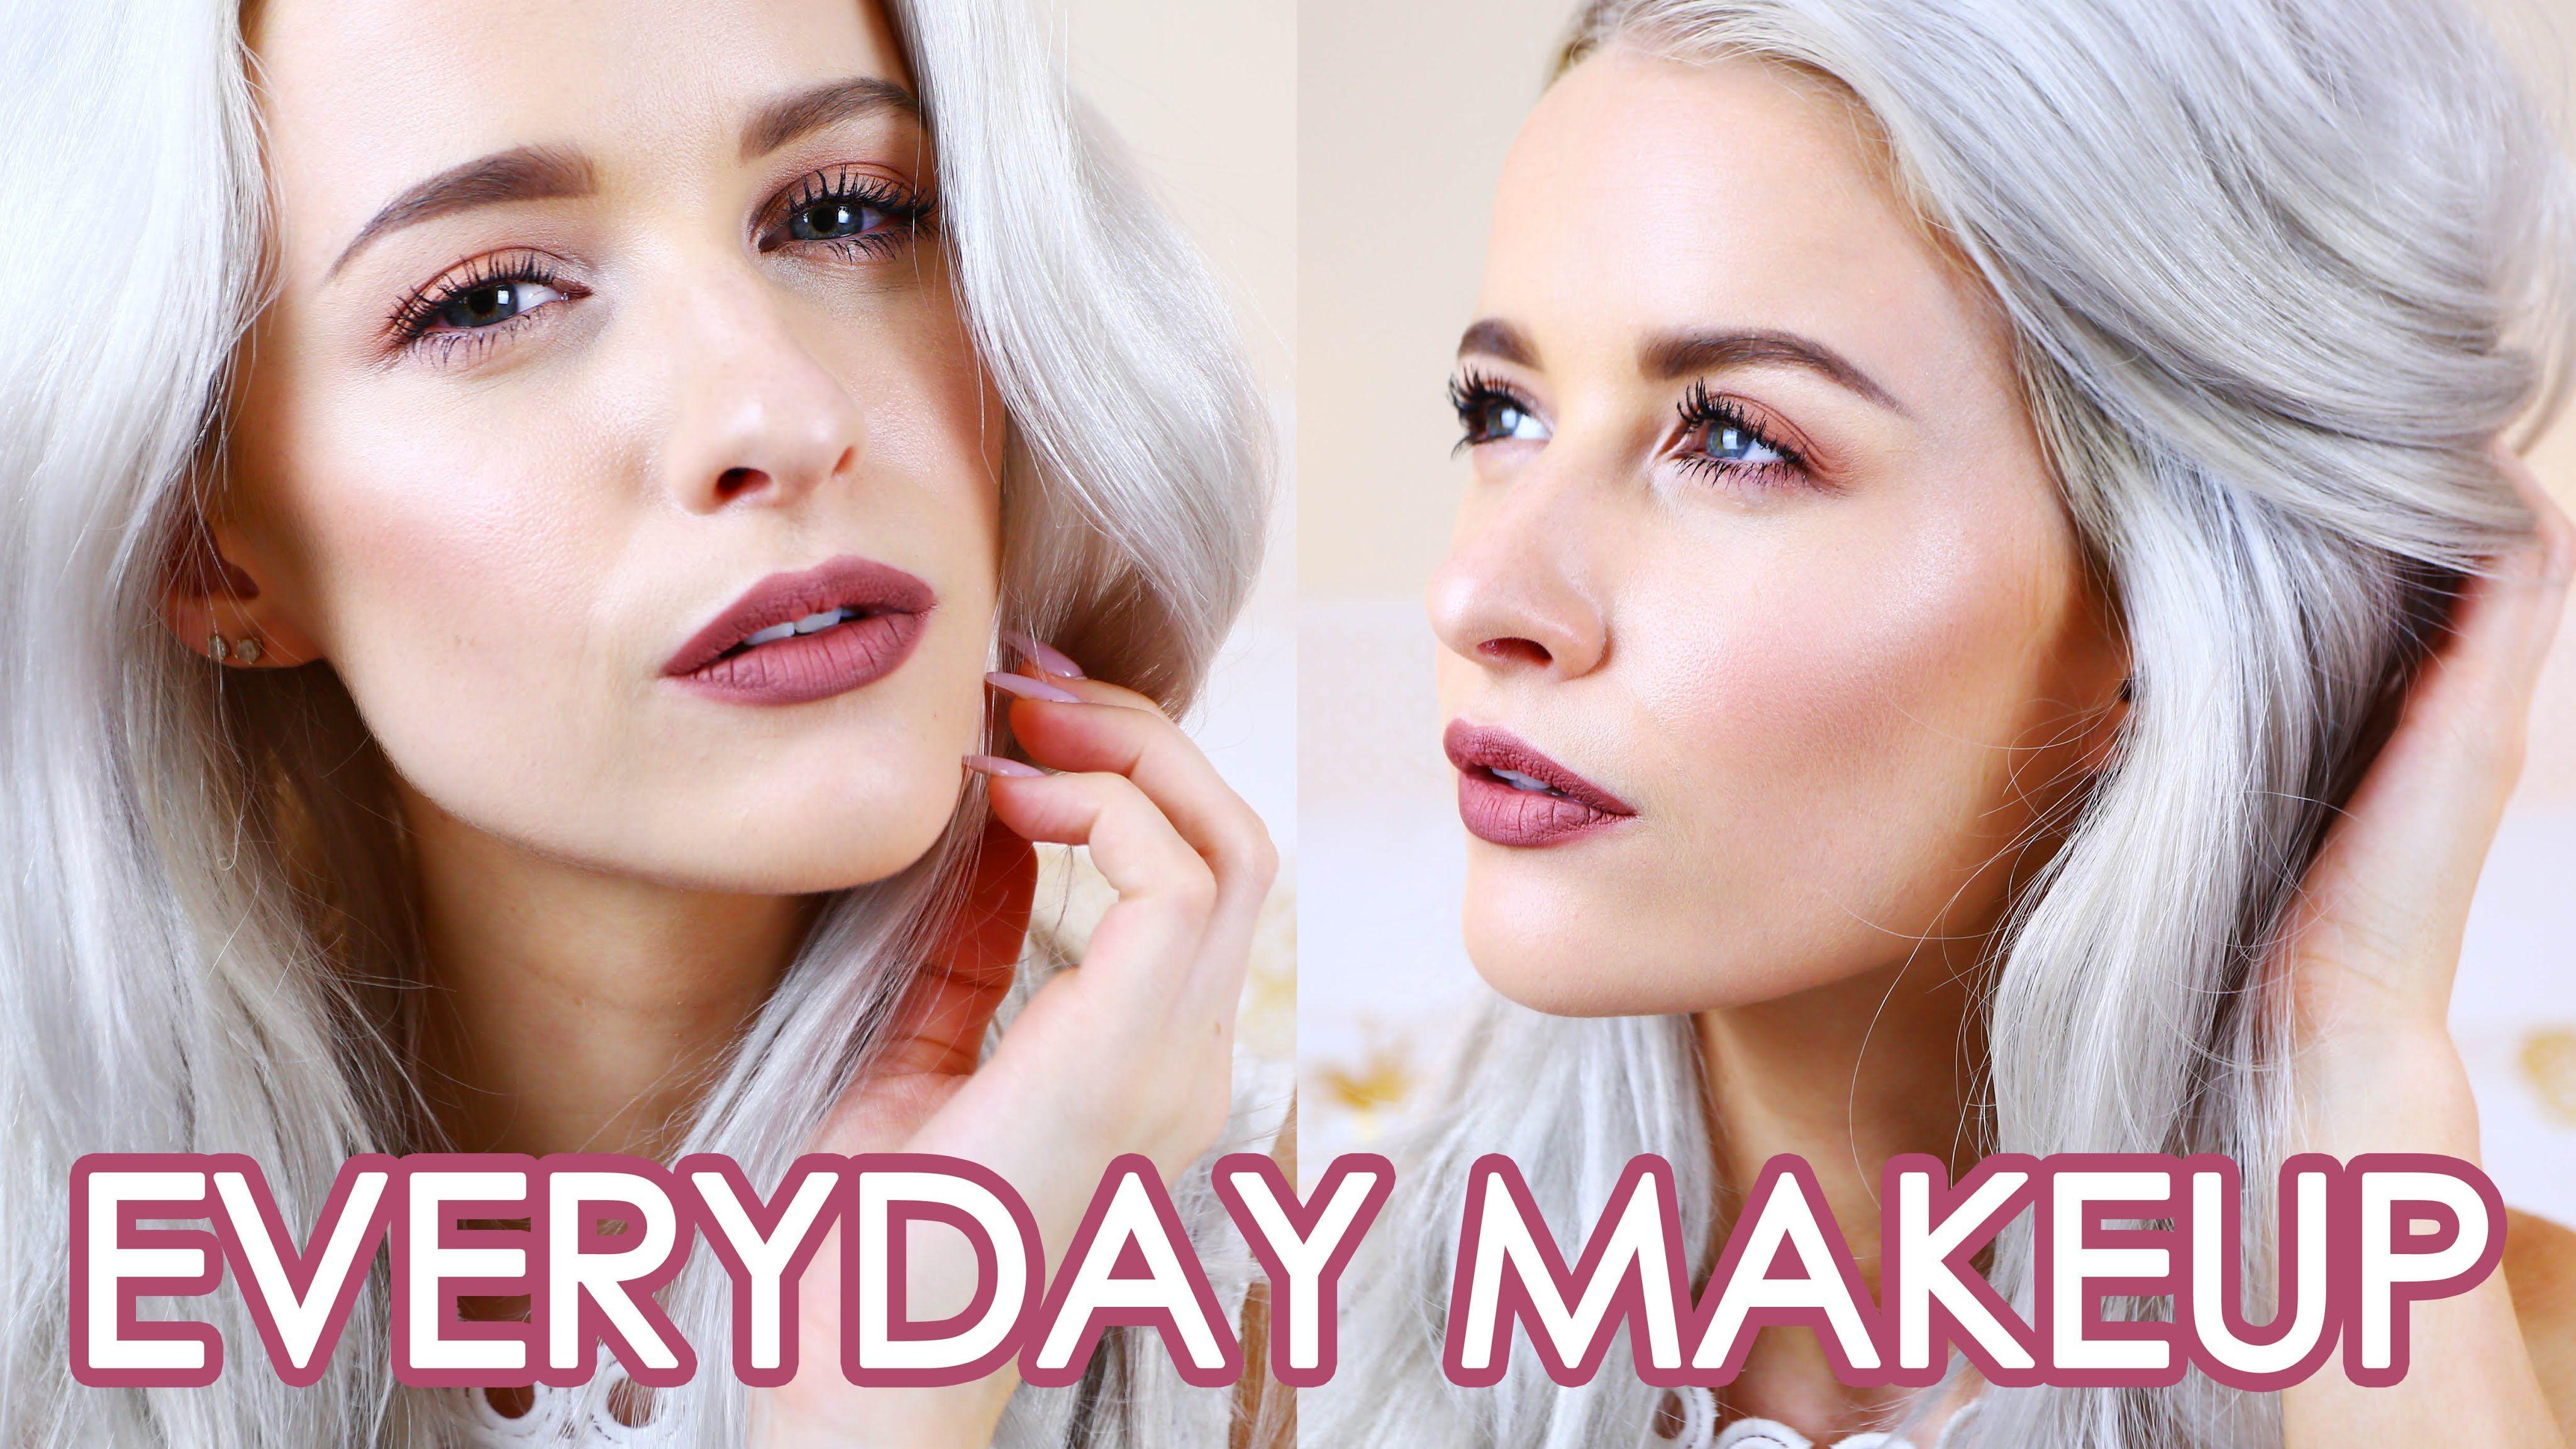 EVERYDAY MAKEUP ROUTINE Bronzed Dewy Skin Makeup